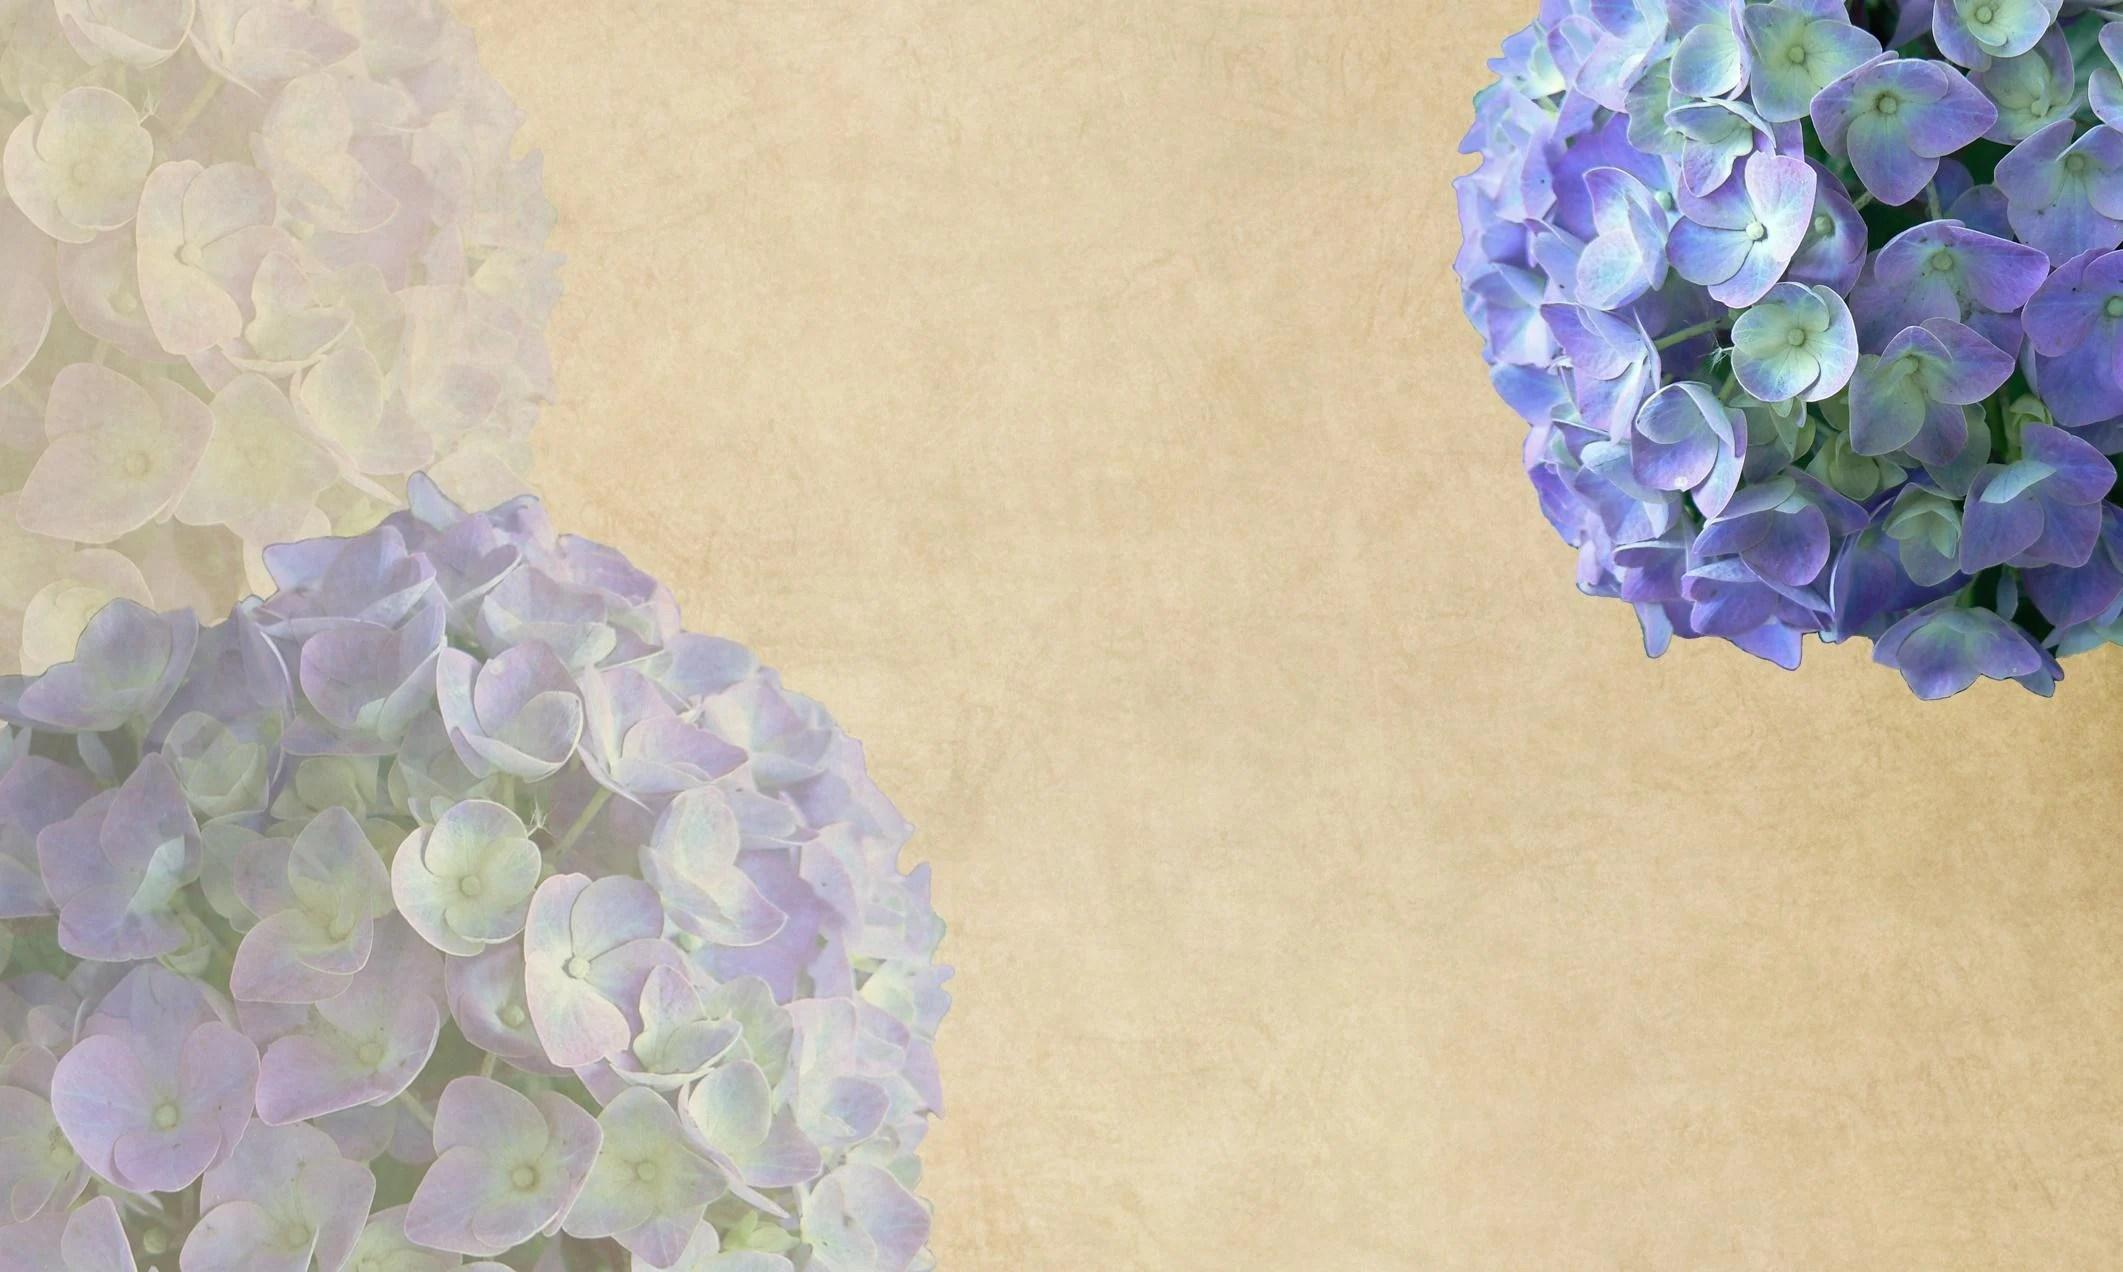 Anime Wallpaper 2014 Hydrangea Backgrounds Wallpaper Cave